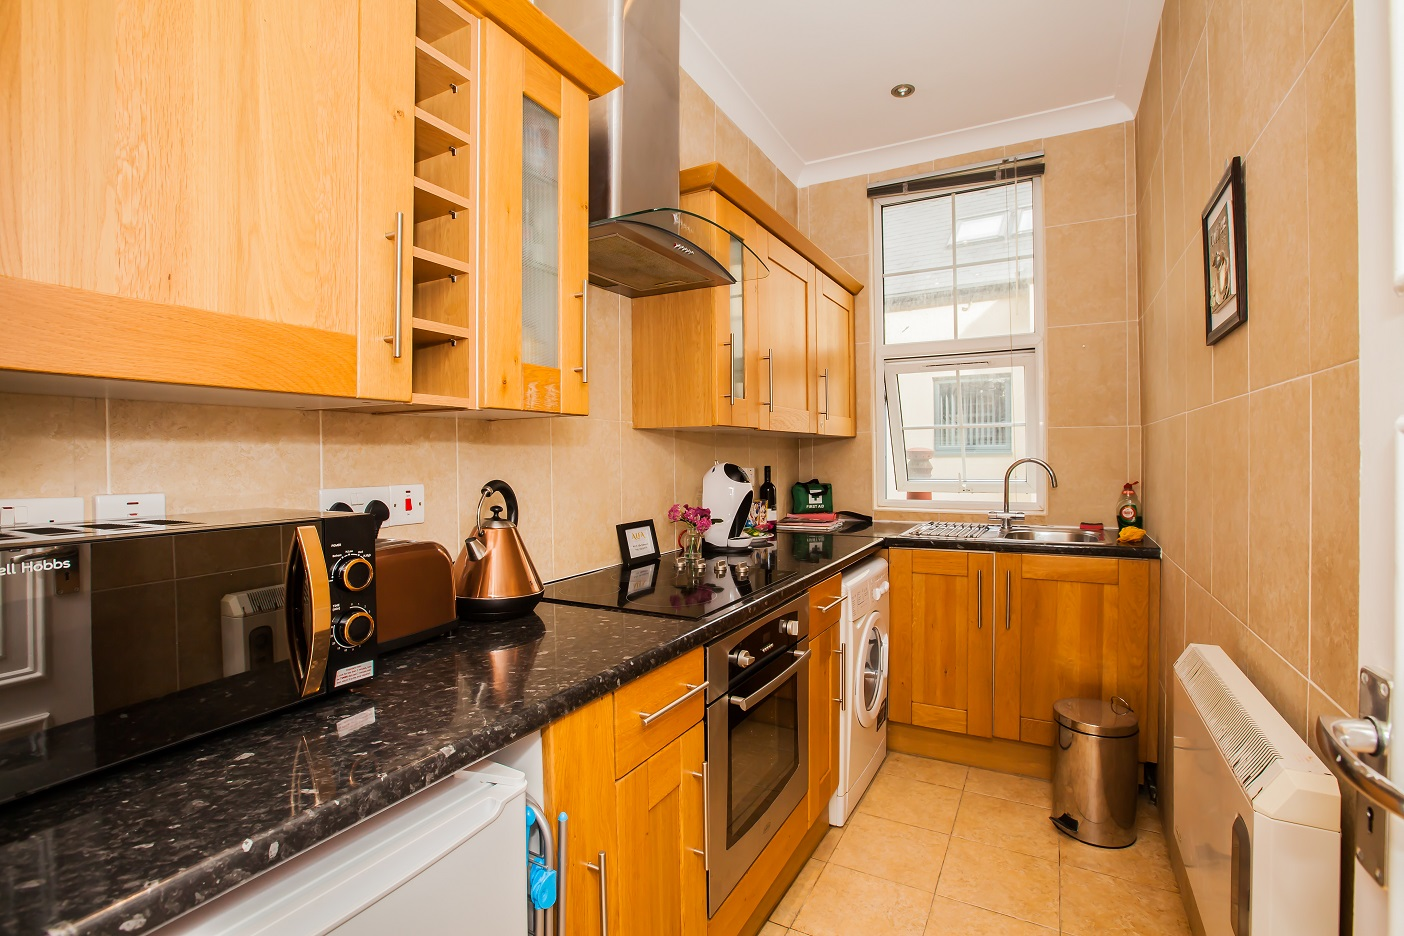 Kitchen at Marylebone Serviced Apartments, Marylebone, London - Citybase Apartments